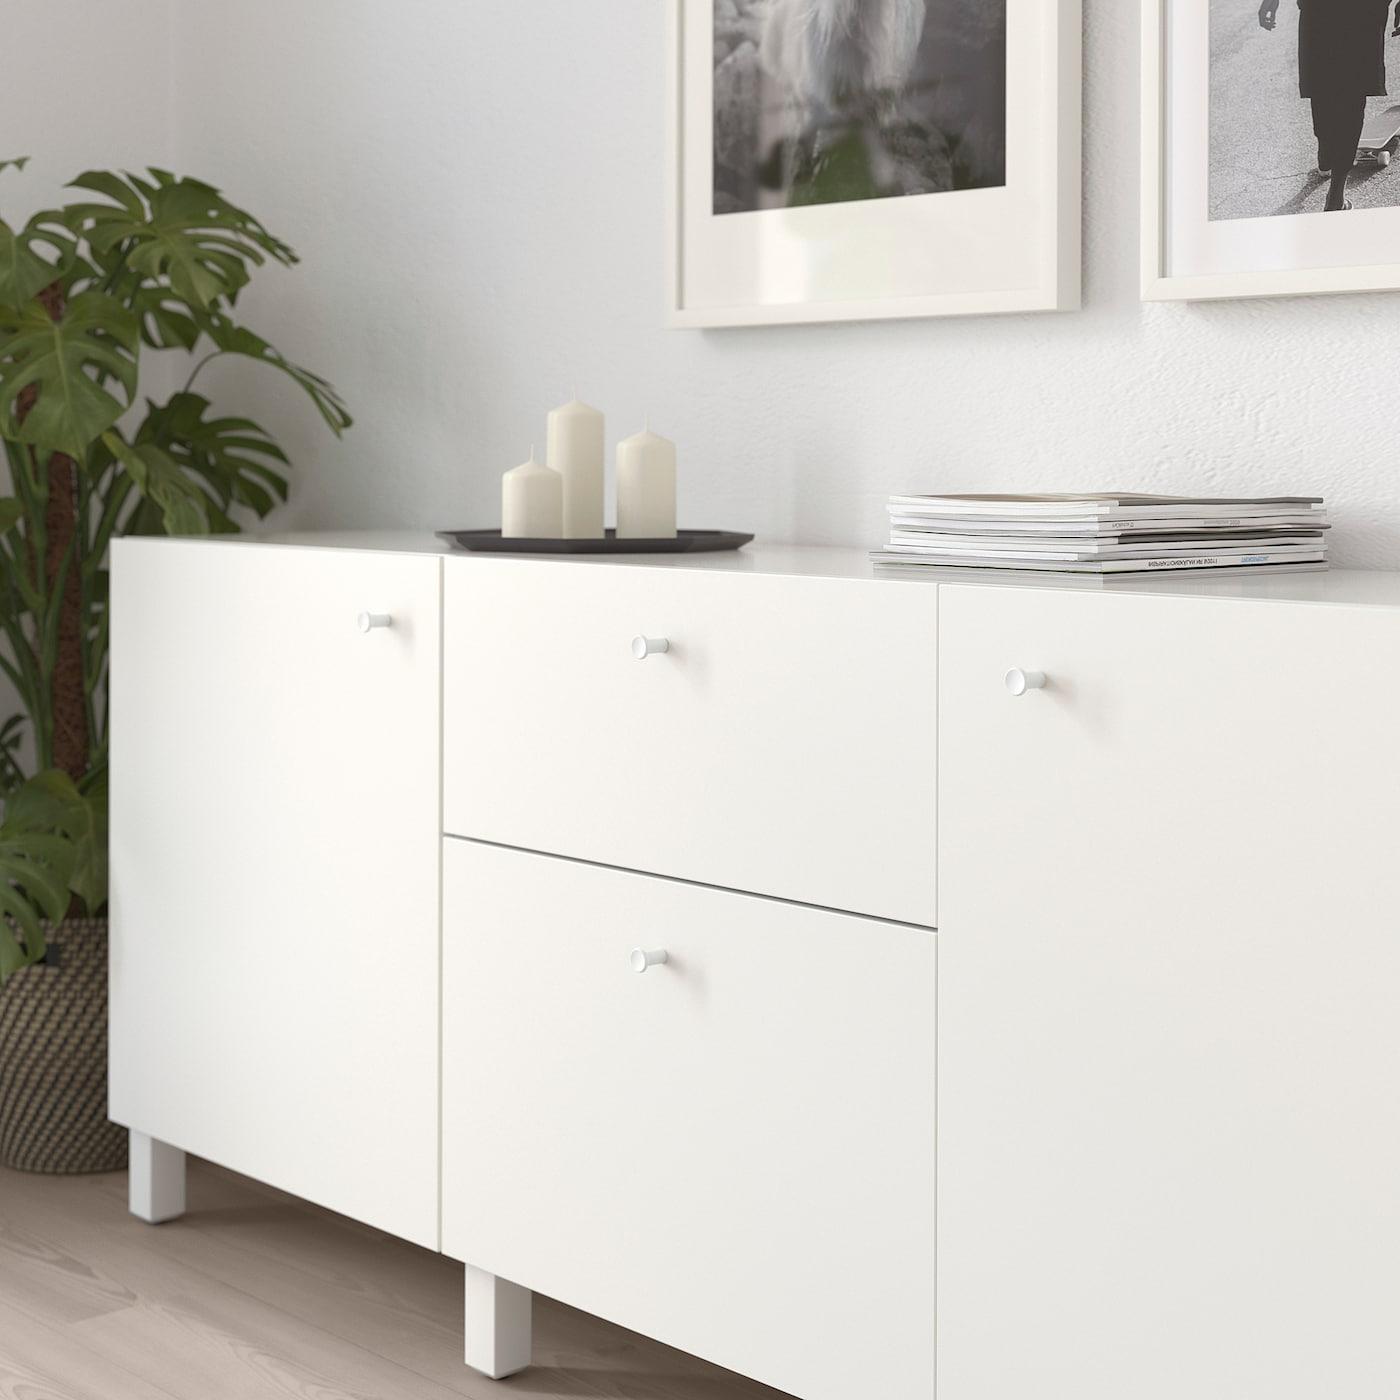 Picture of: Gubbarp Knop Hvid 21 Mm Ikea